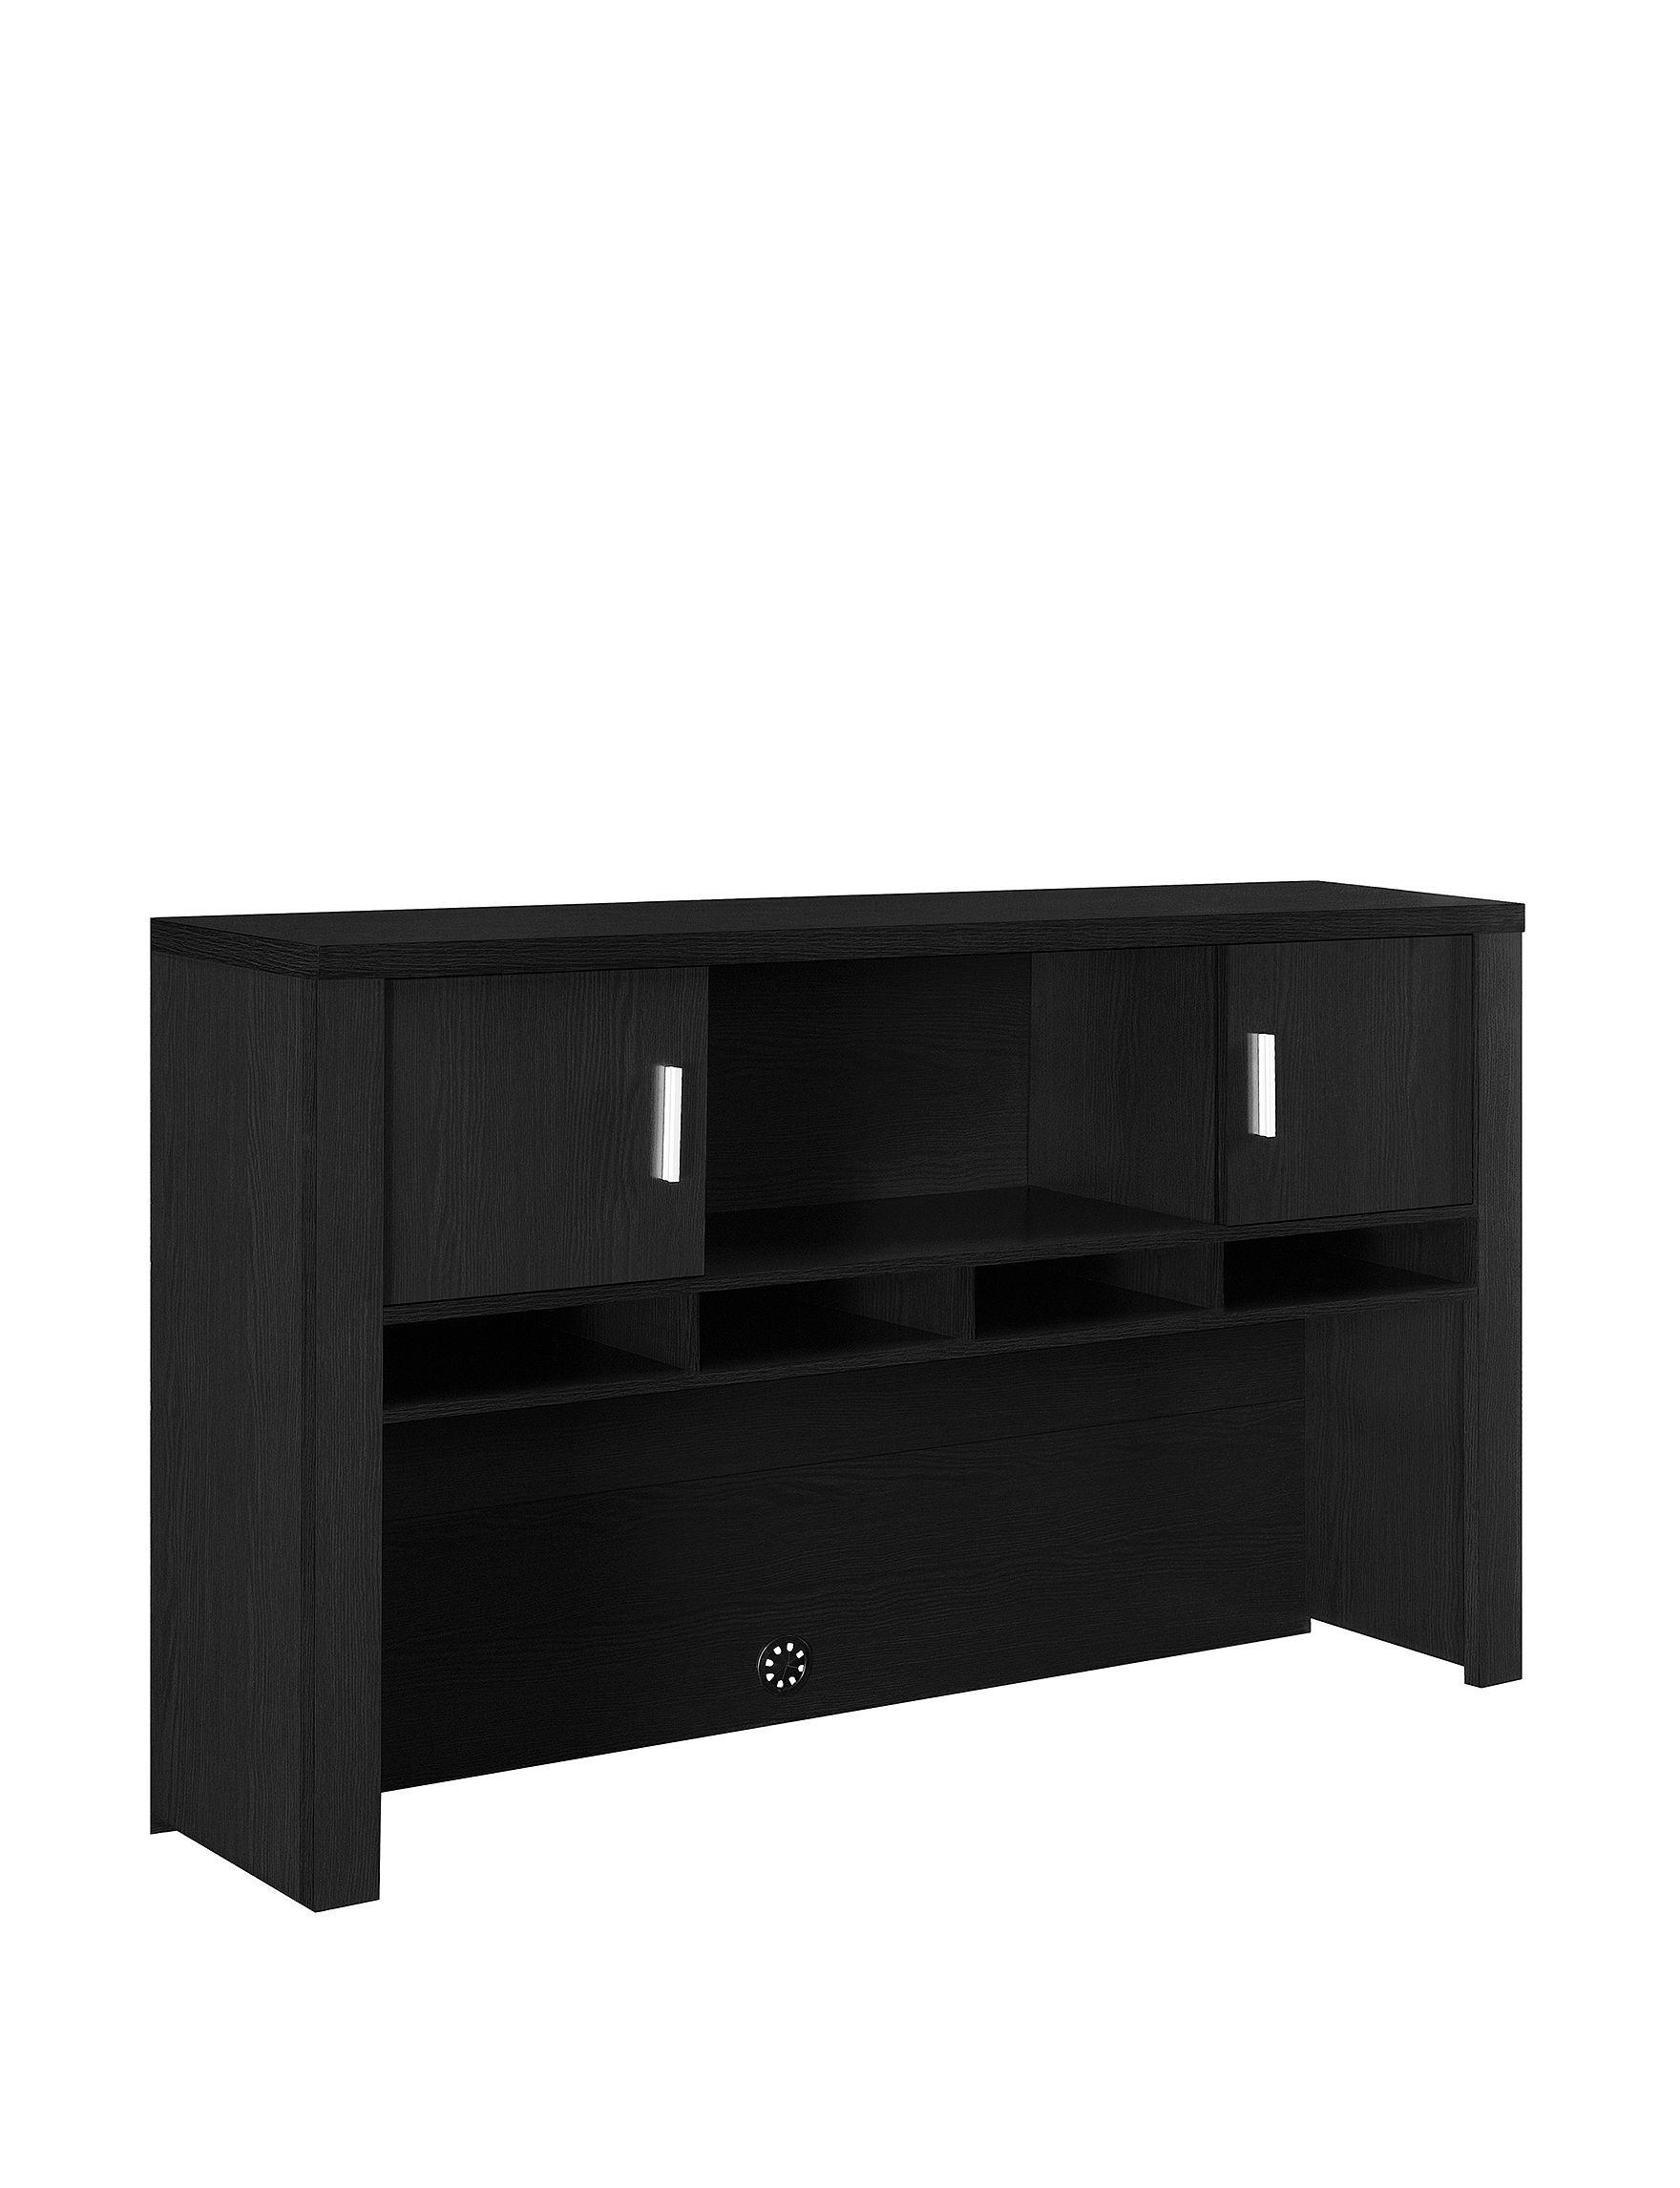 Altra Espresso TV Stands & Entertainment Centers Home Office Furniture